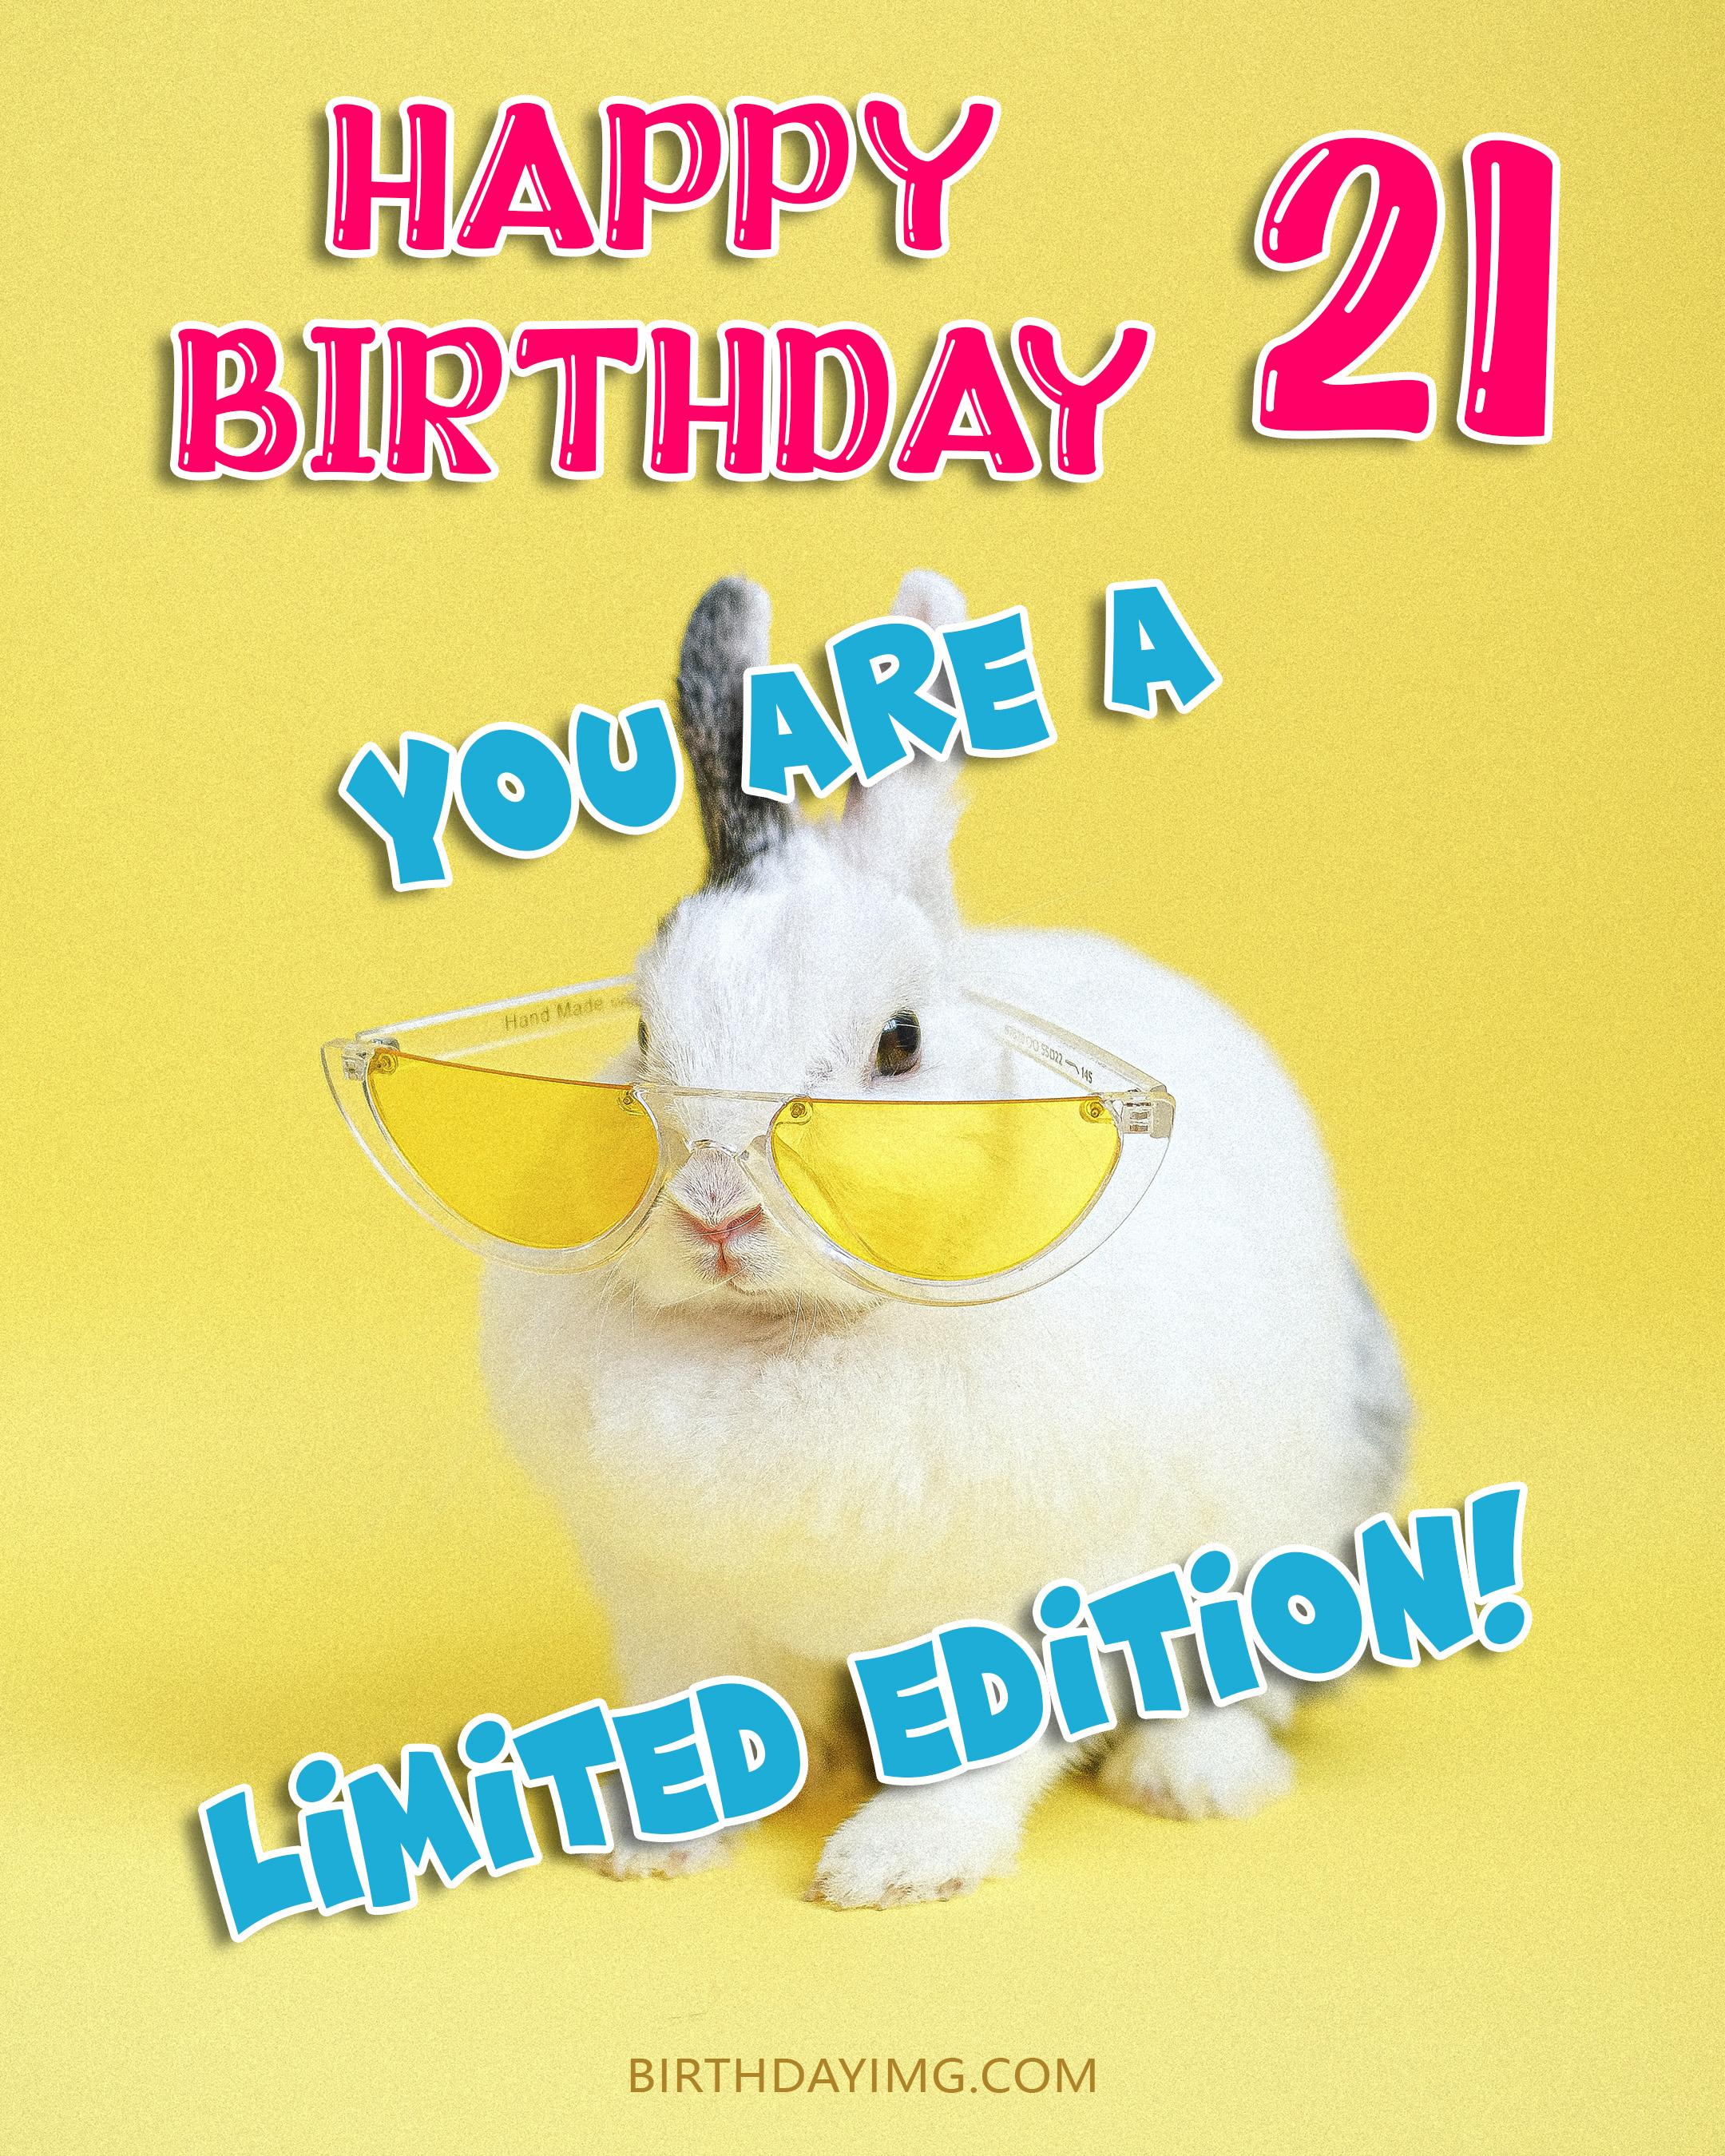 Free 21th Years Happy Birthday Image With Cute Rabbit - birthdayimg.com